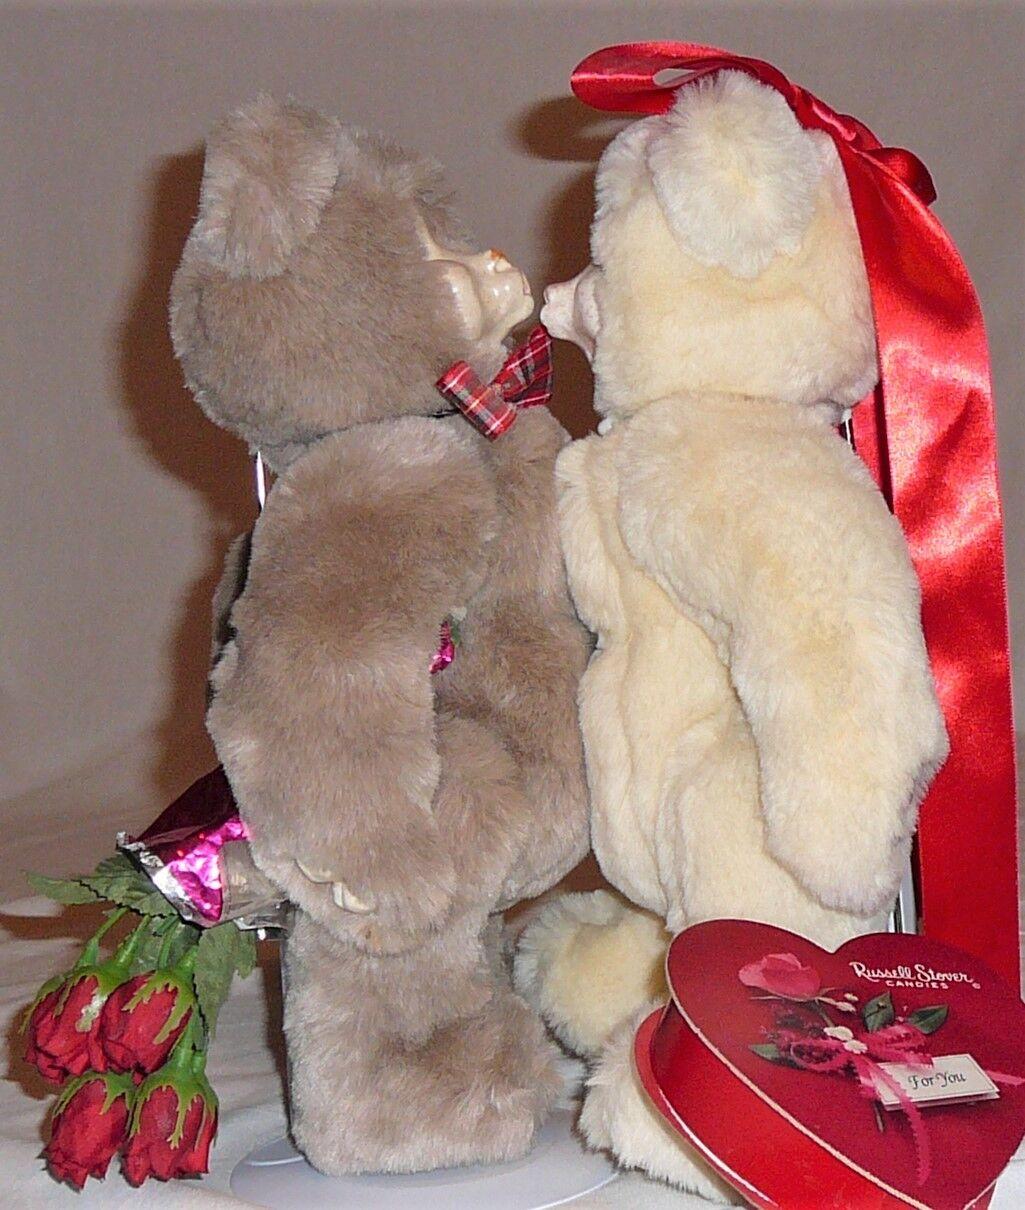 Kissing Bears, quality fur and porcelain, circa 1980s